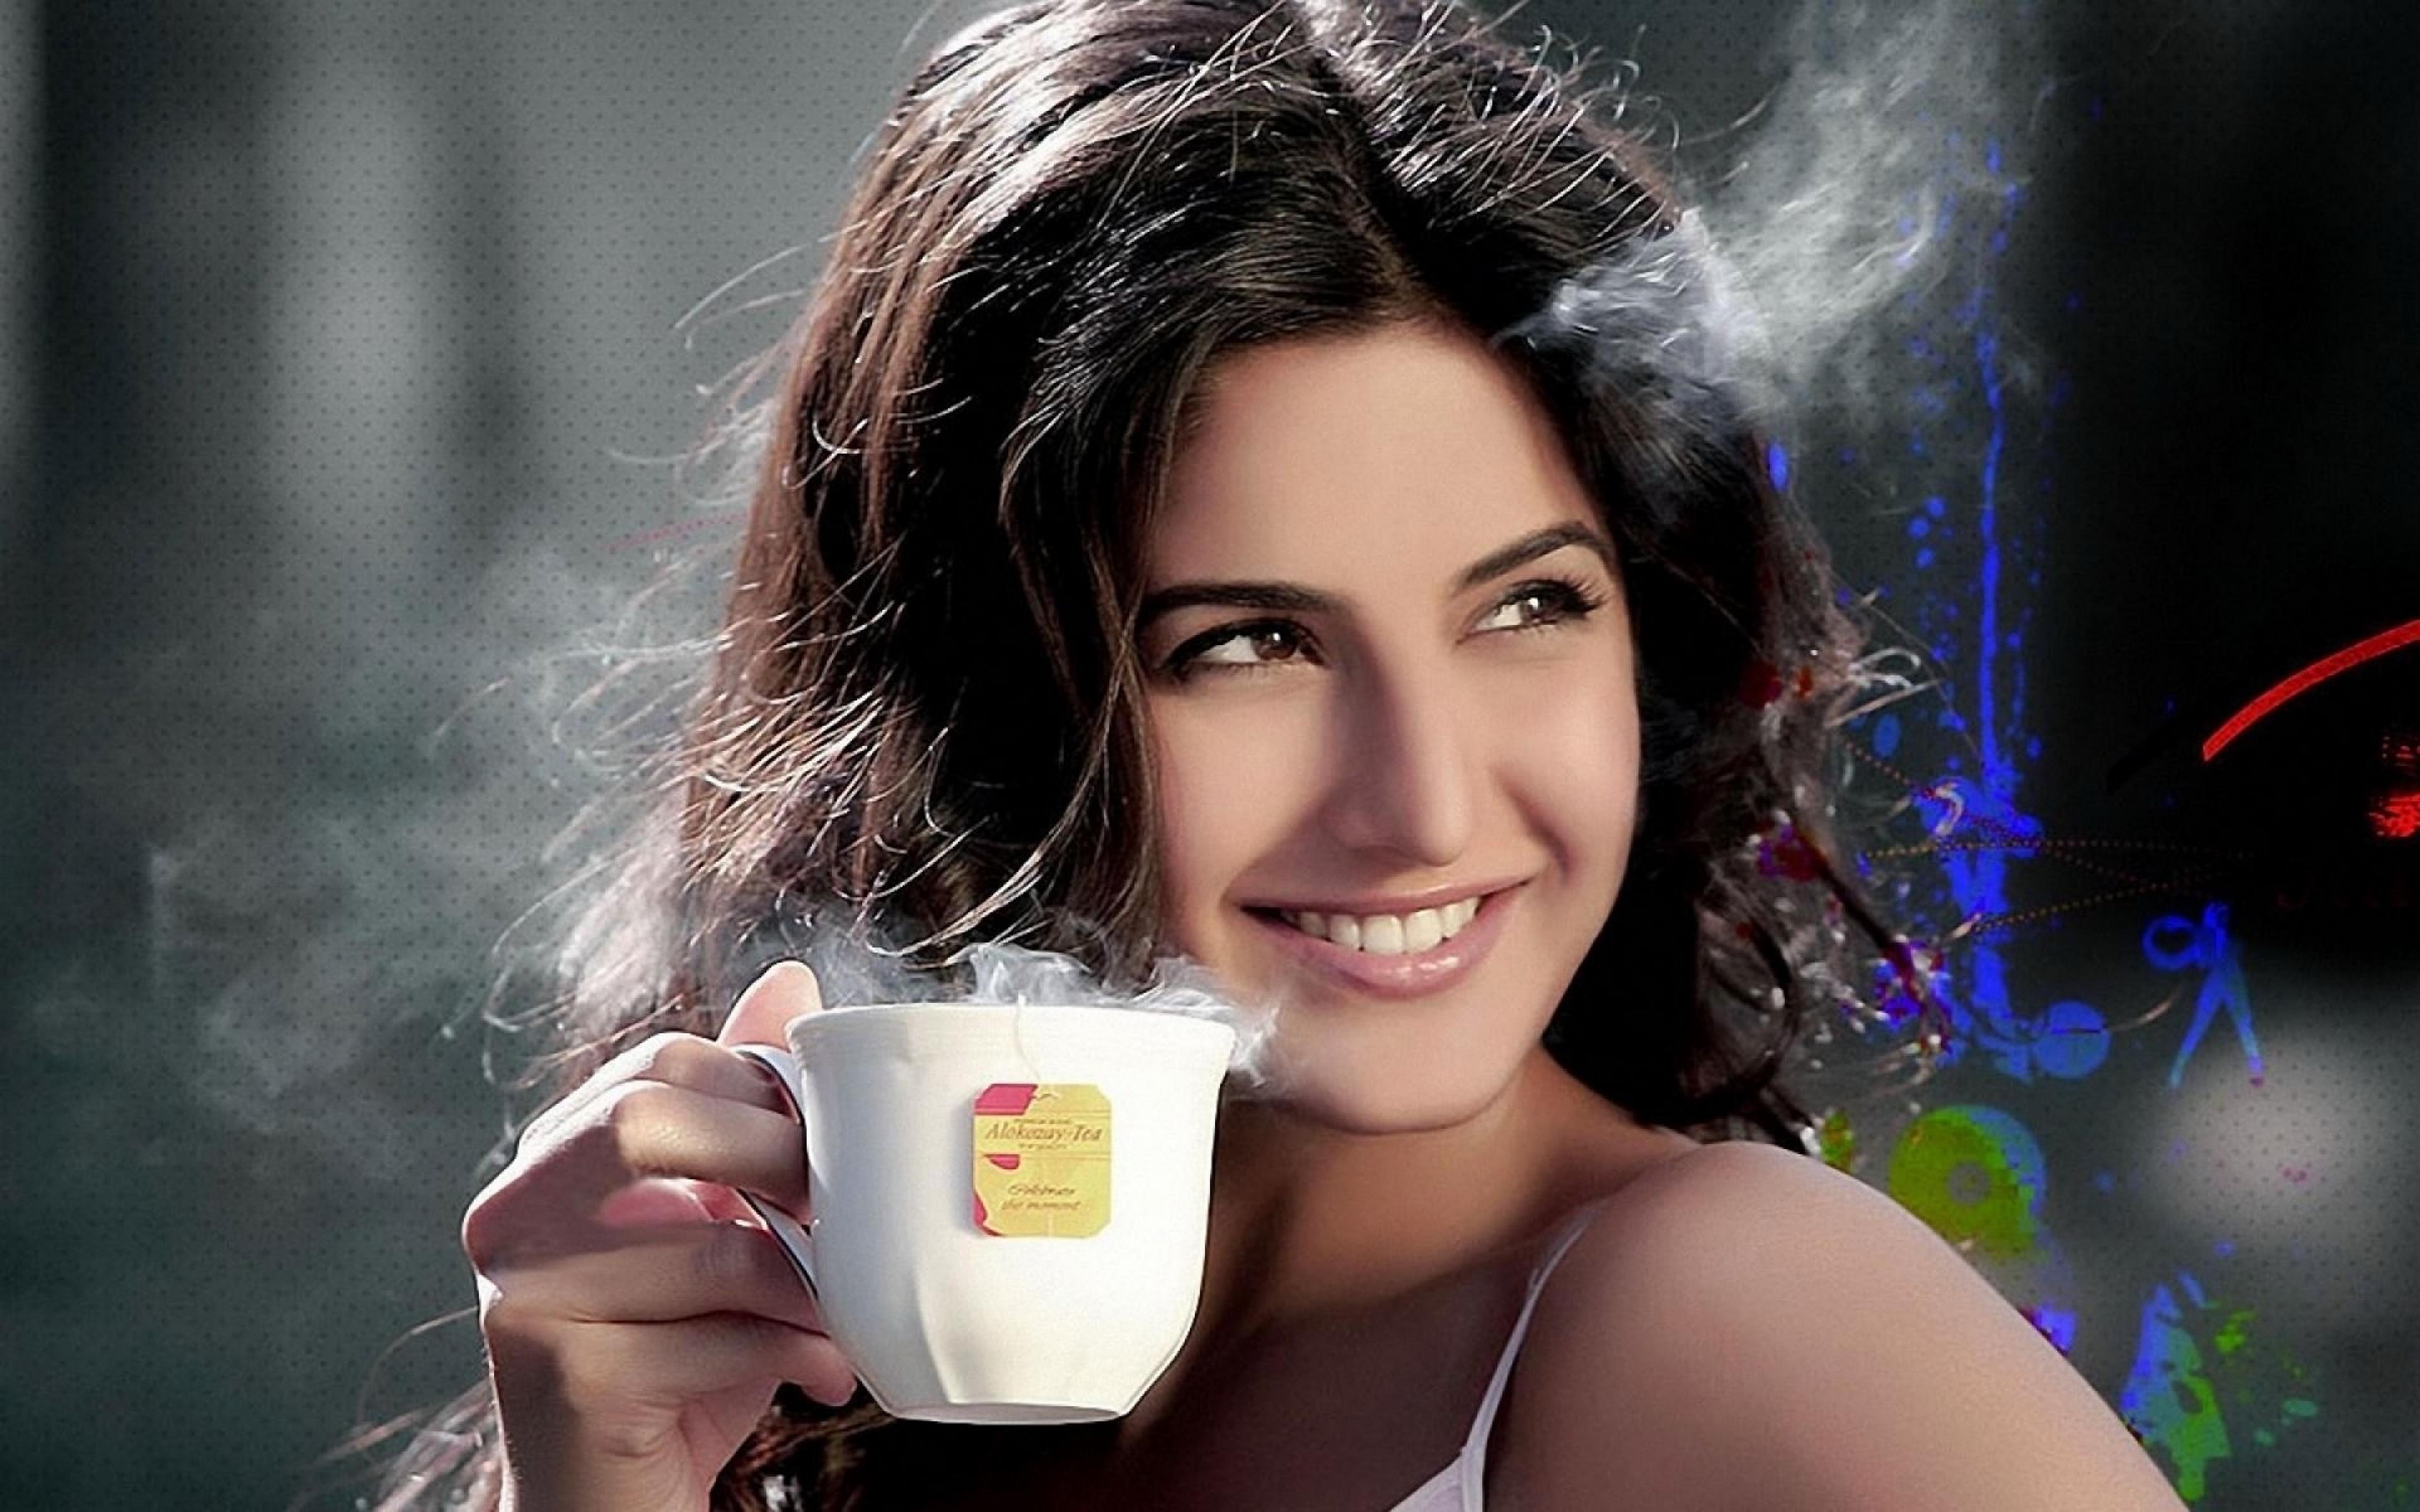 девушка лицо чаепитие girl face the tea party  № 1849741 бесплатно